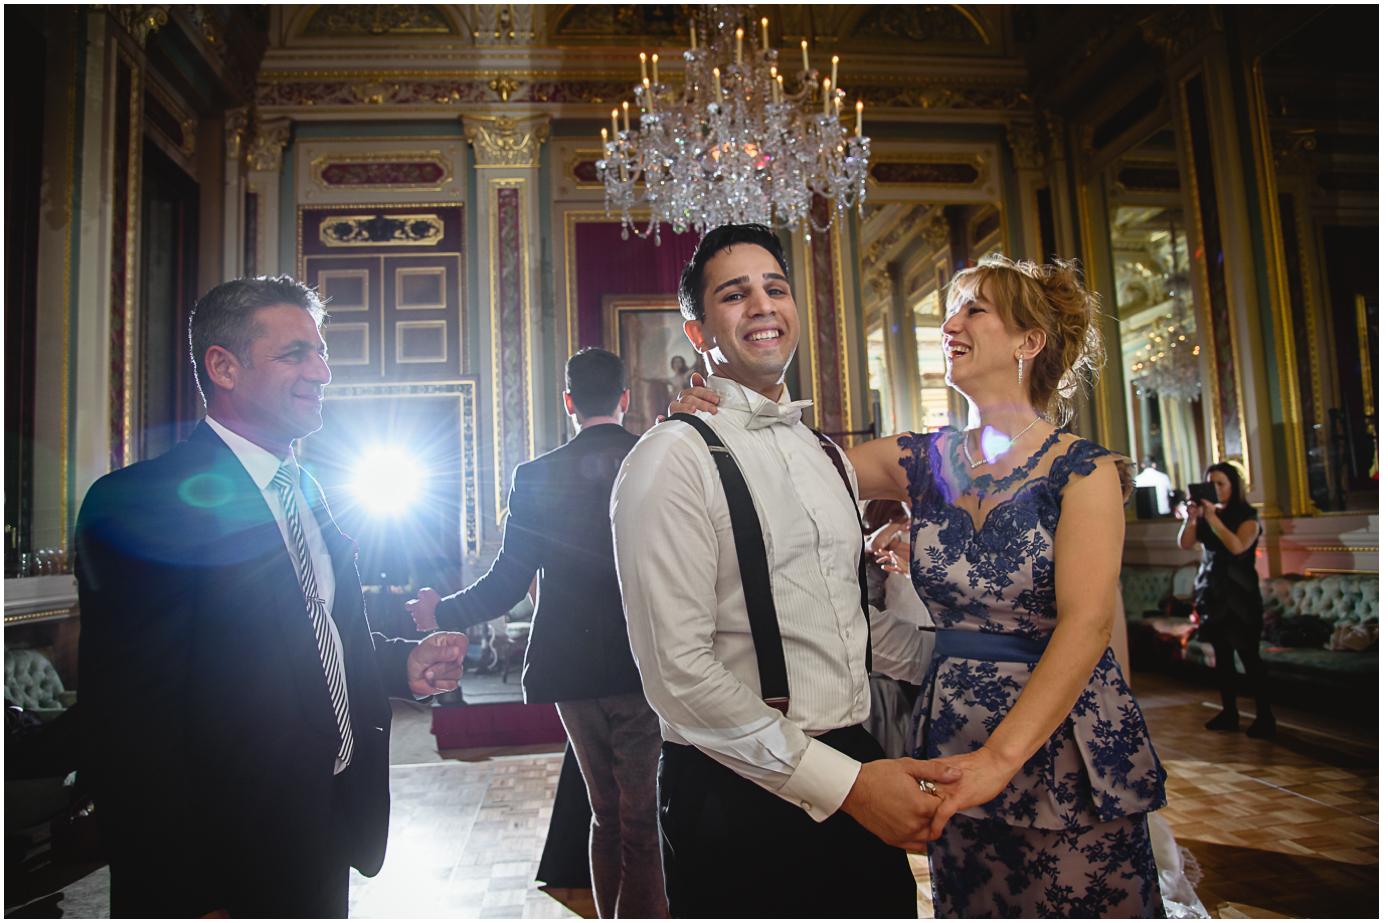 iranian wedding photographer 240 - Drapers Hall London Wedding Photographer